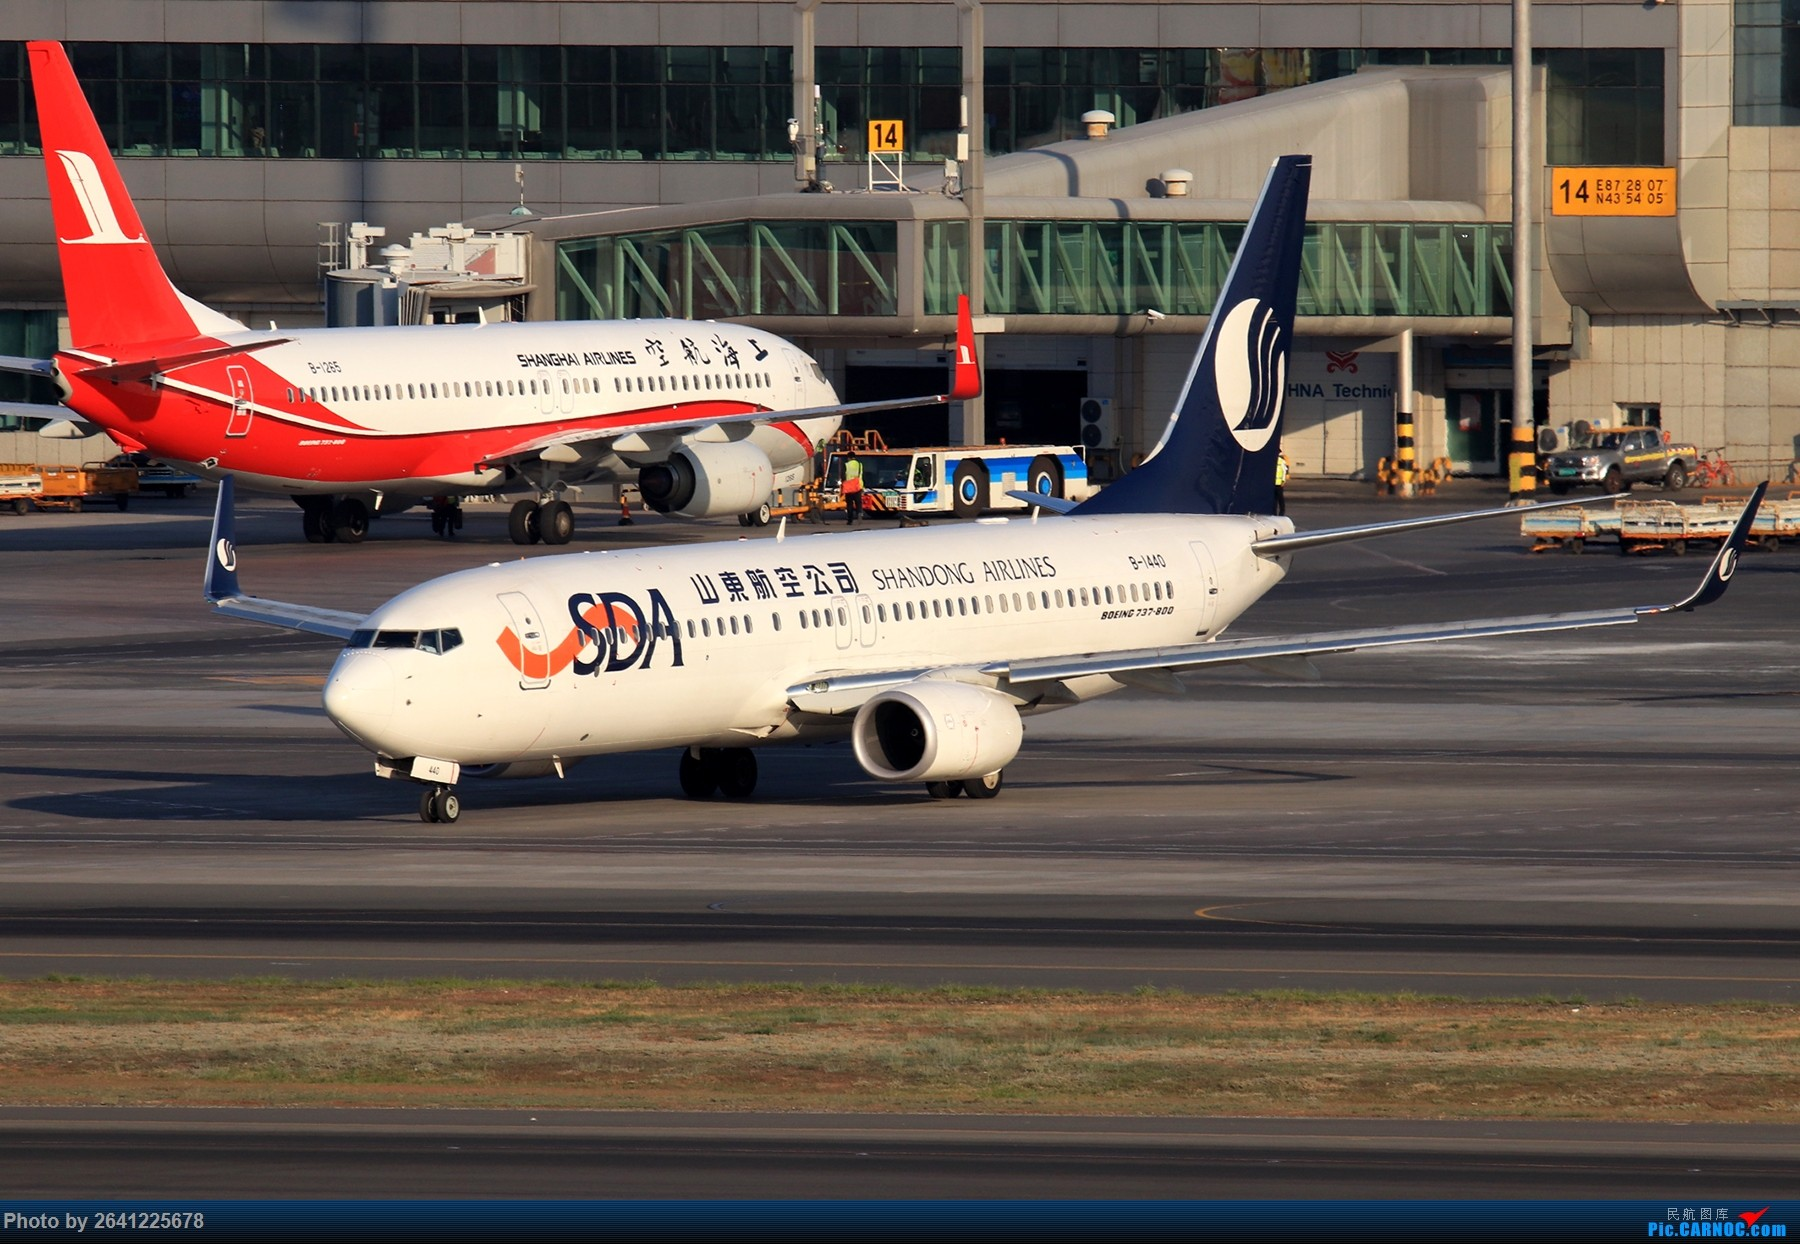 Re:[原创]【小周游记第7集拍机贴】乌鲁木齐绝美的地景和光线 BOEING 737-800 B-1440 中国乌鲁木齐地窝堡国际机场